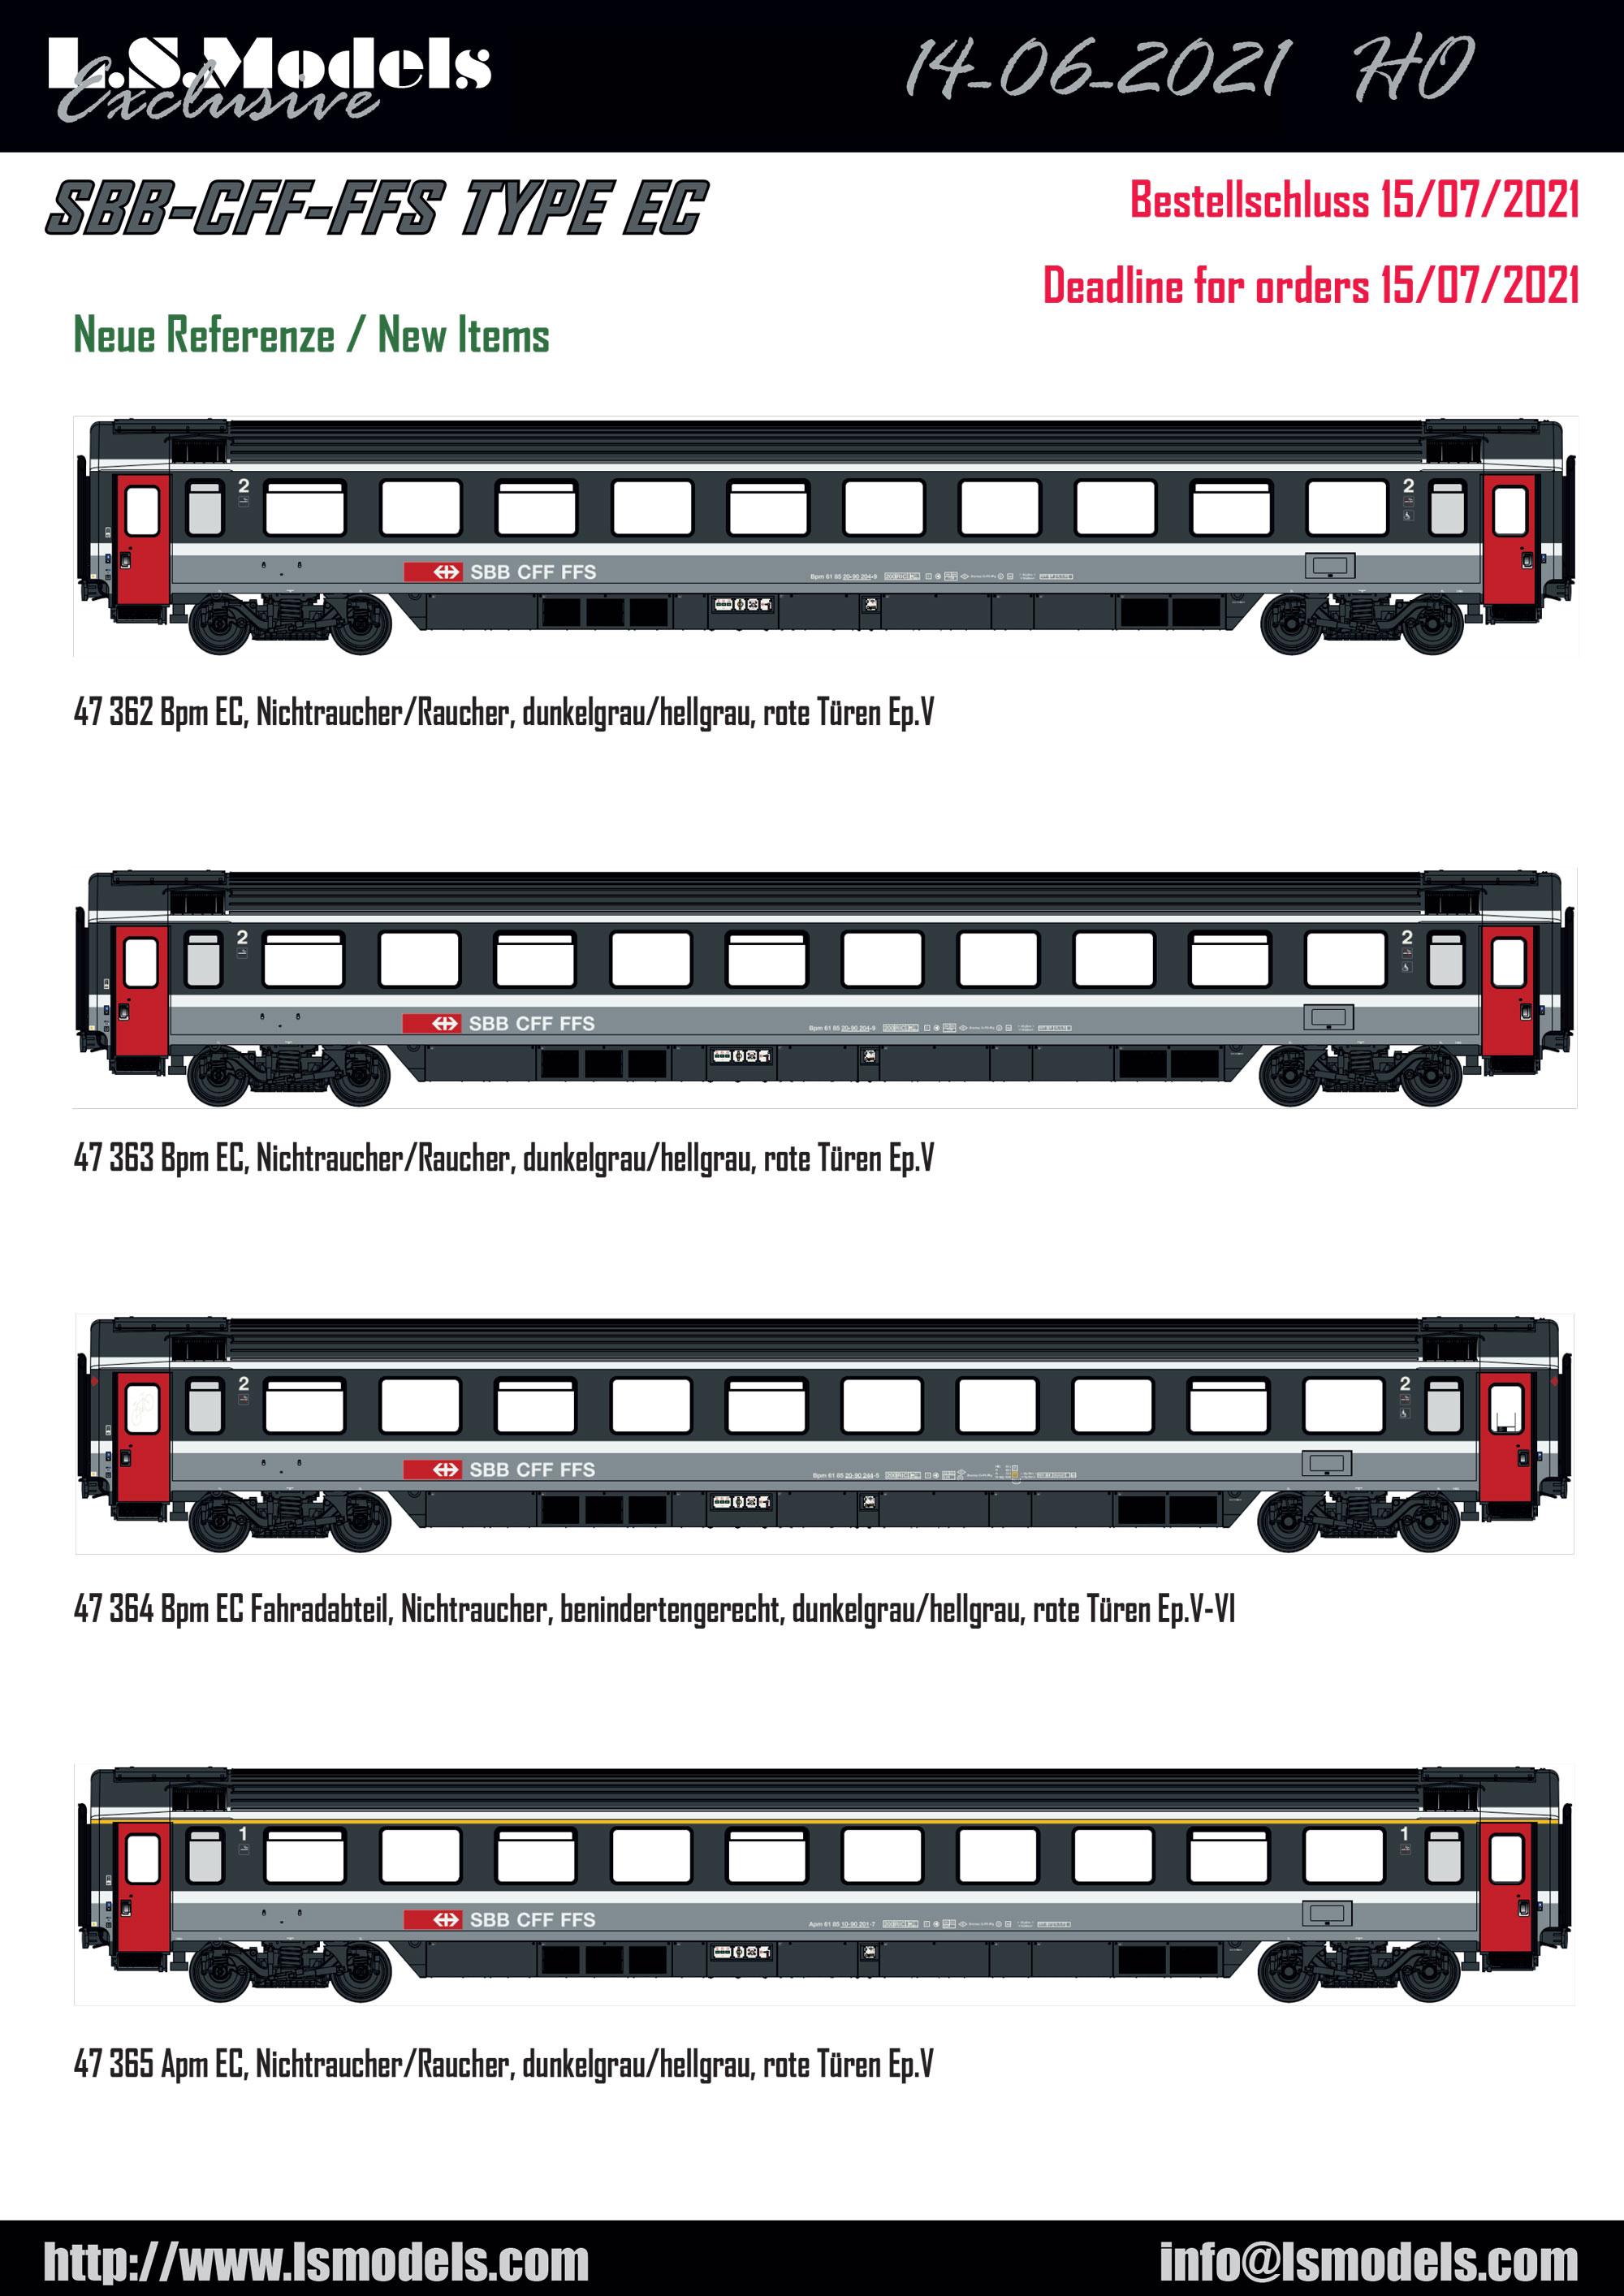 LS Models - SBB CFF FFS - Bpm 20-90 / Apm 10-90 passenger coaches